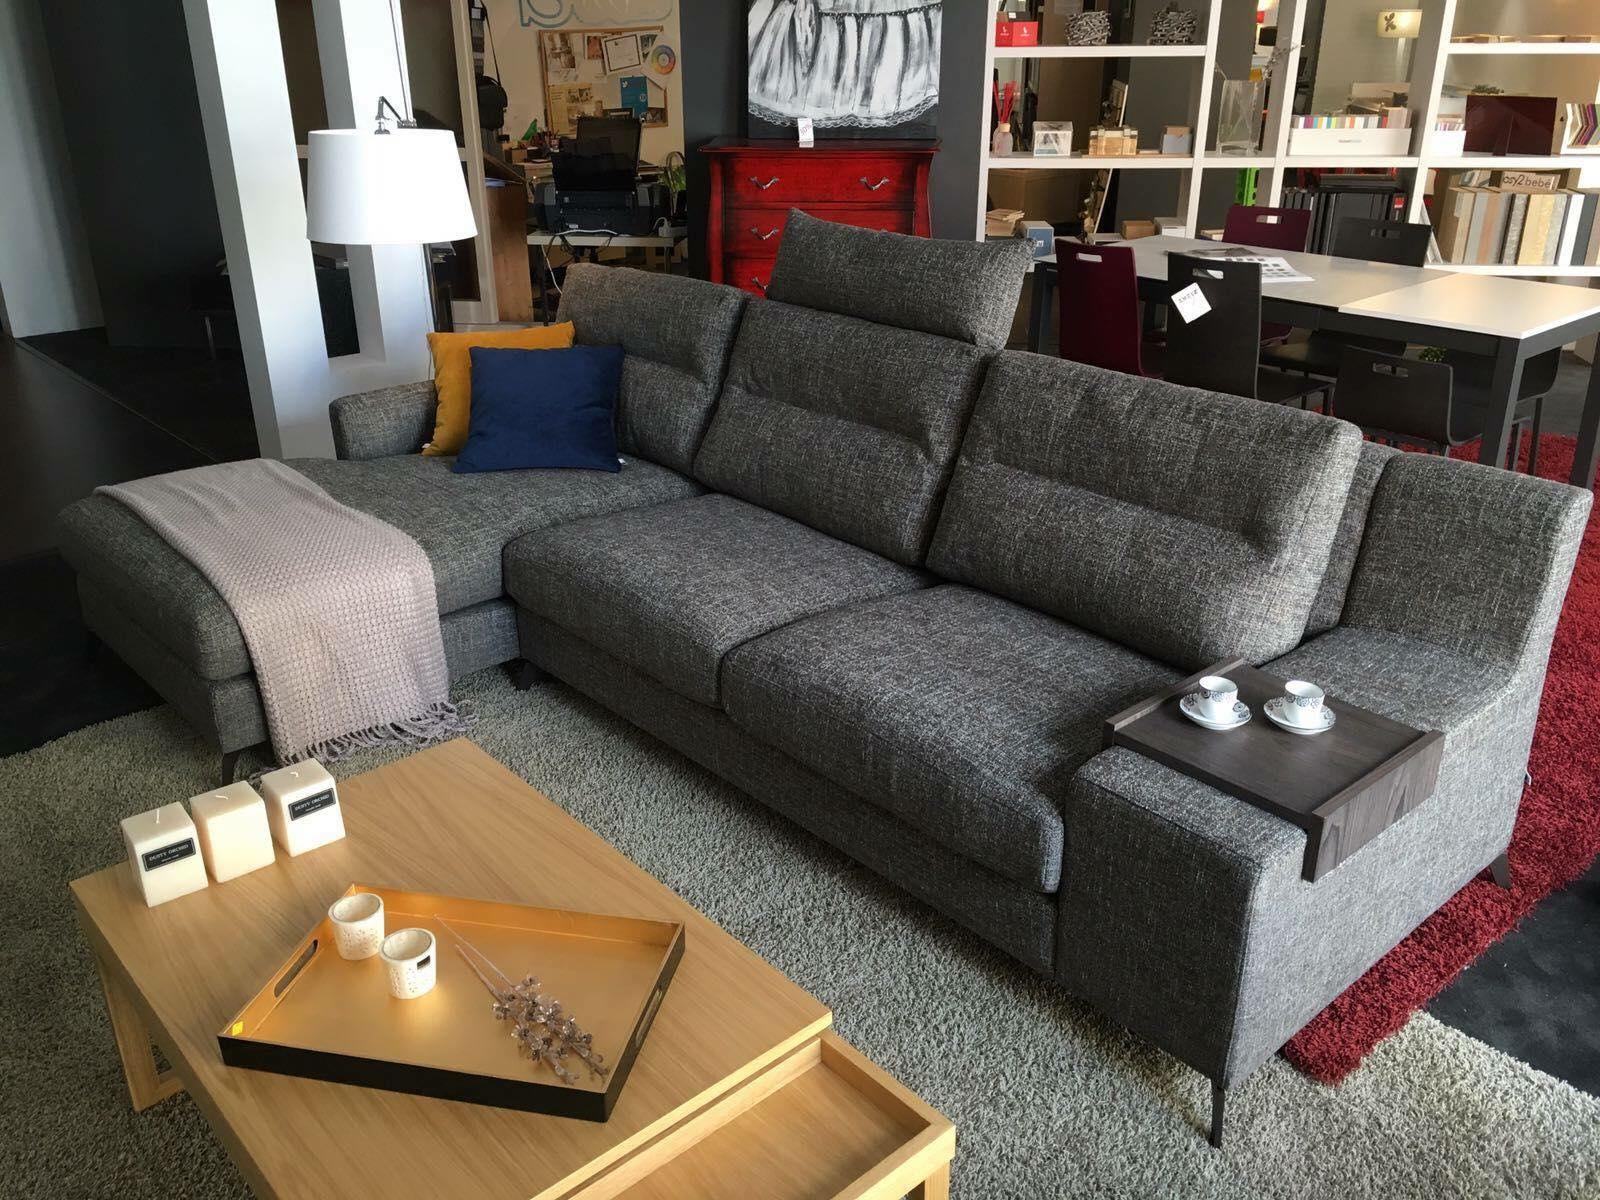 exposicion-salon-muebles-amaya-05